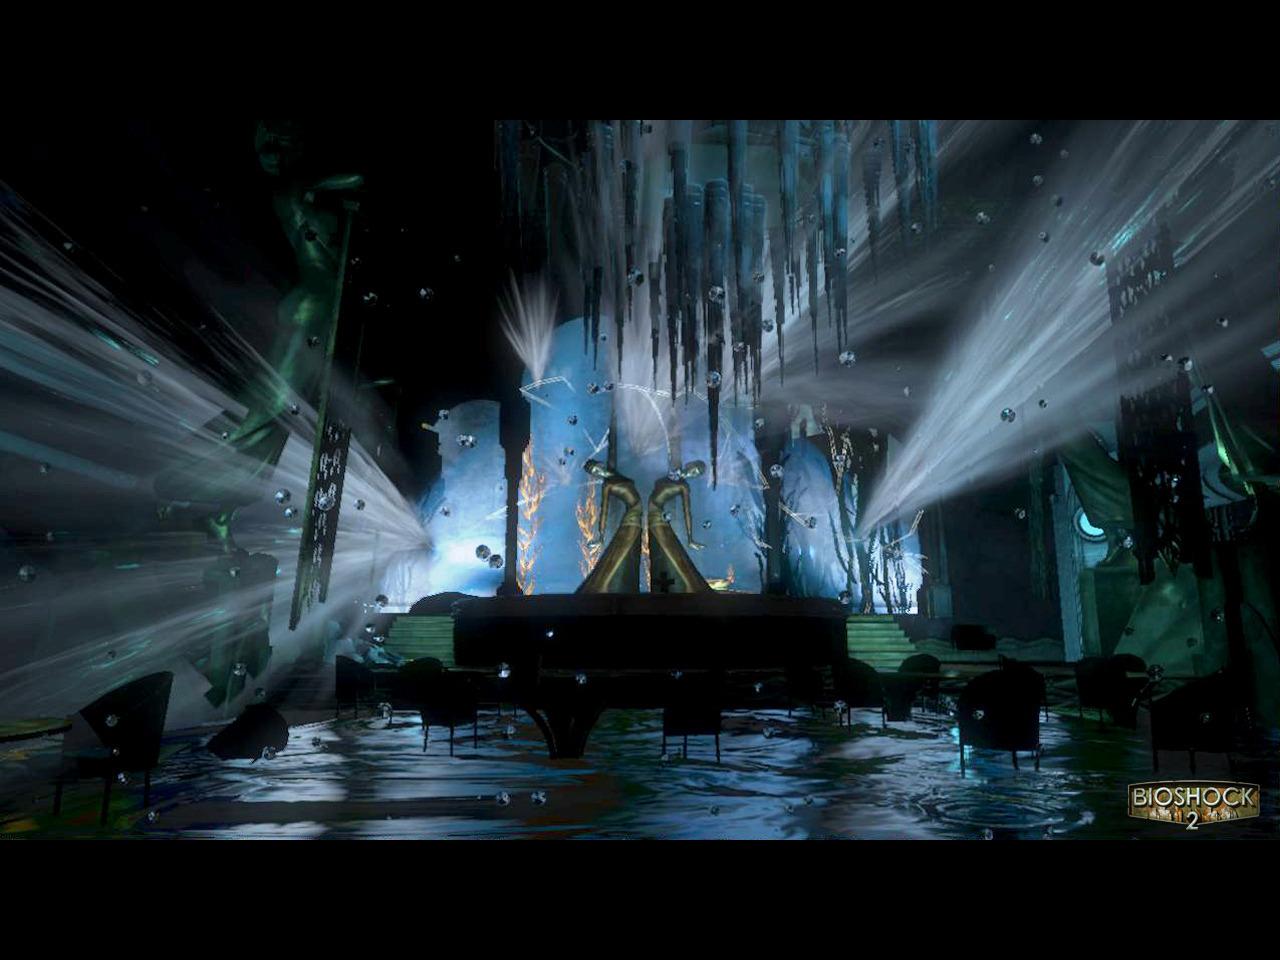 50+ Bioshock 2 Wallpaper 1080p on WallpaperSafari